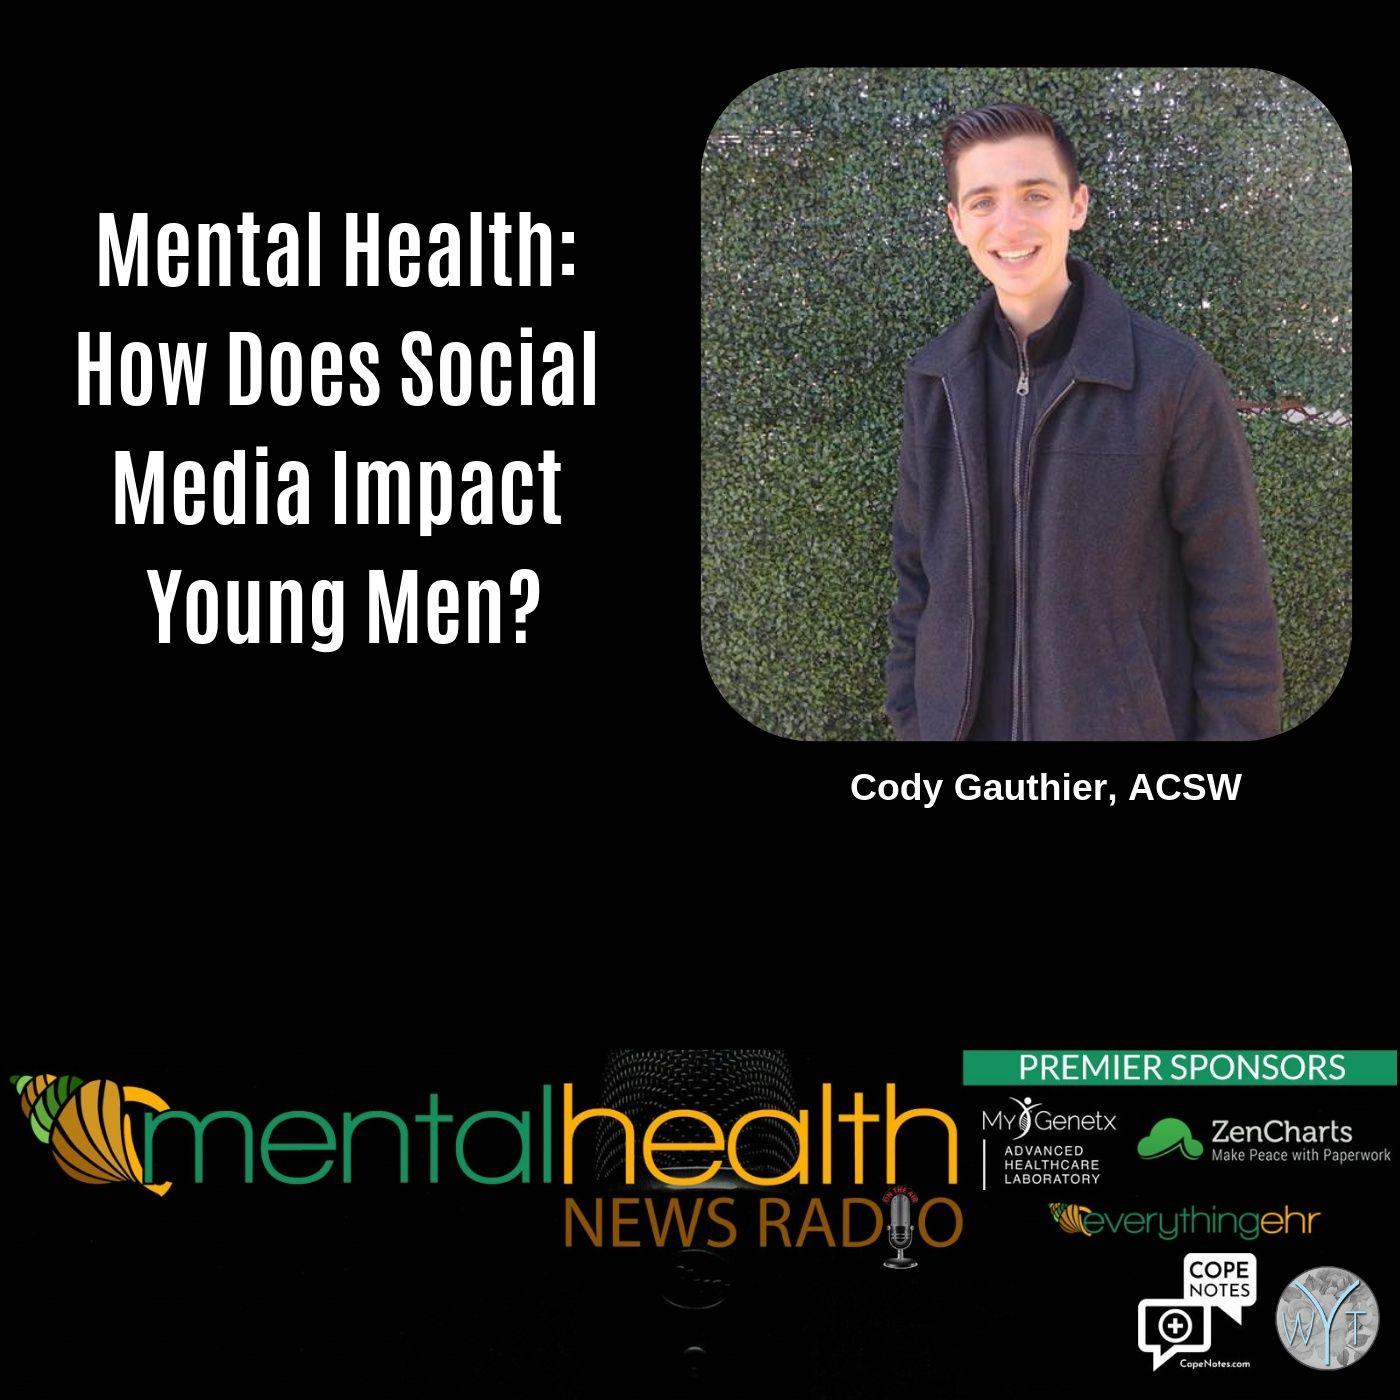 Mental Health News Radio - Mental Health: How Does Social Media Impact Young Men?